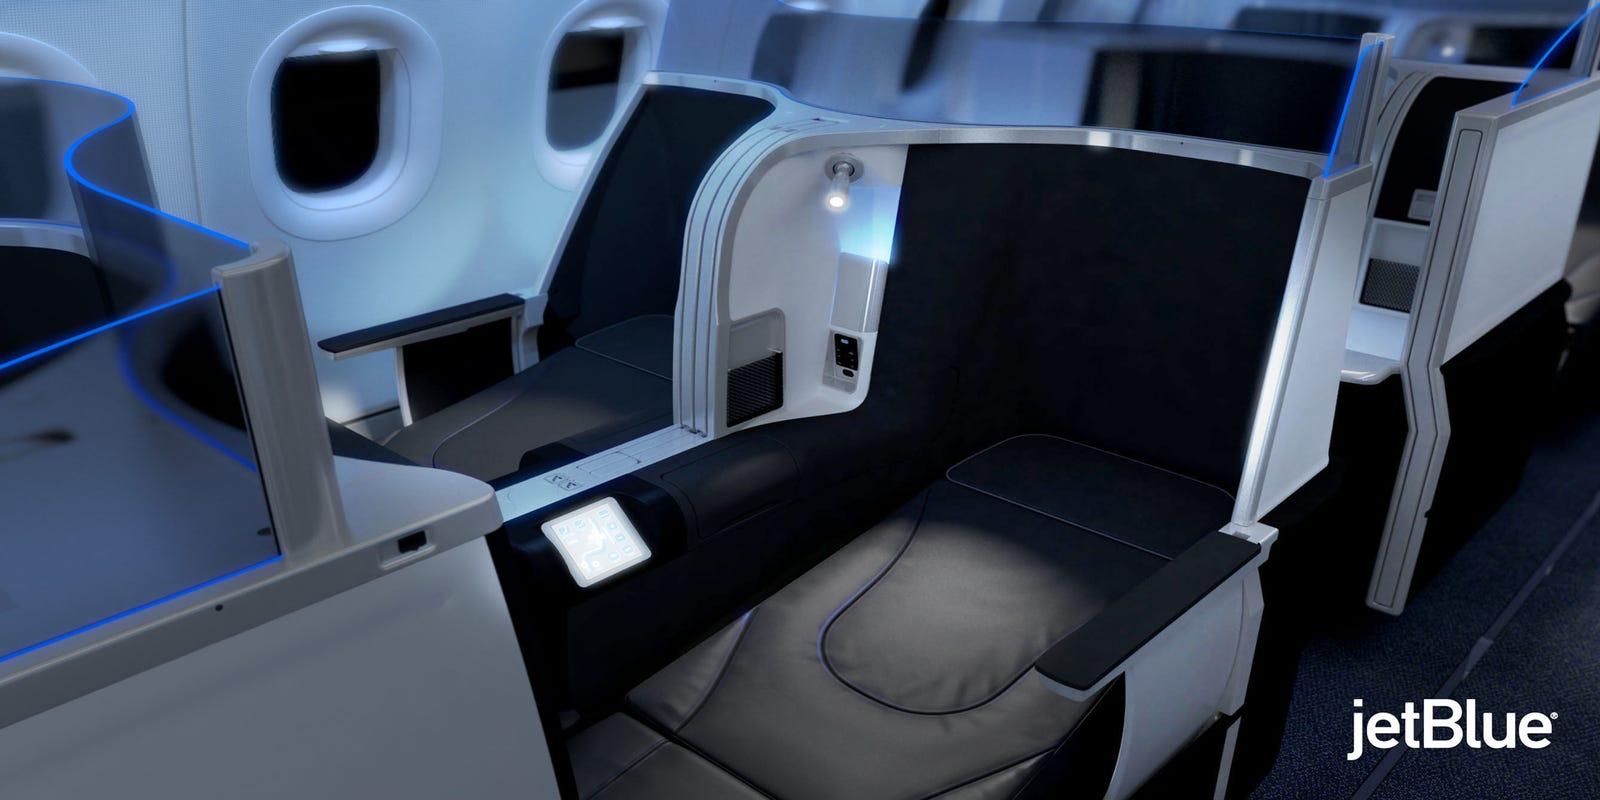 JetBlue Launches Premium Brand Called Mint